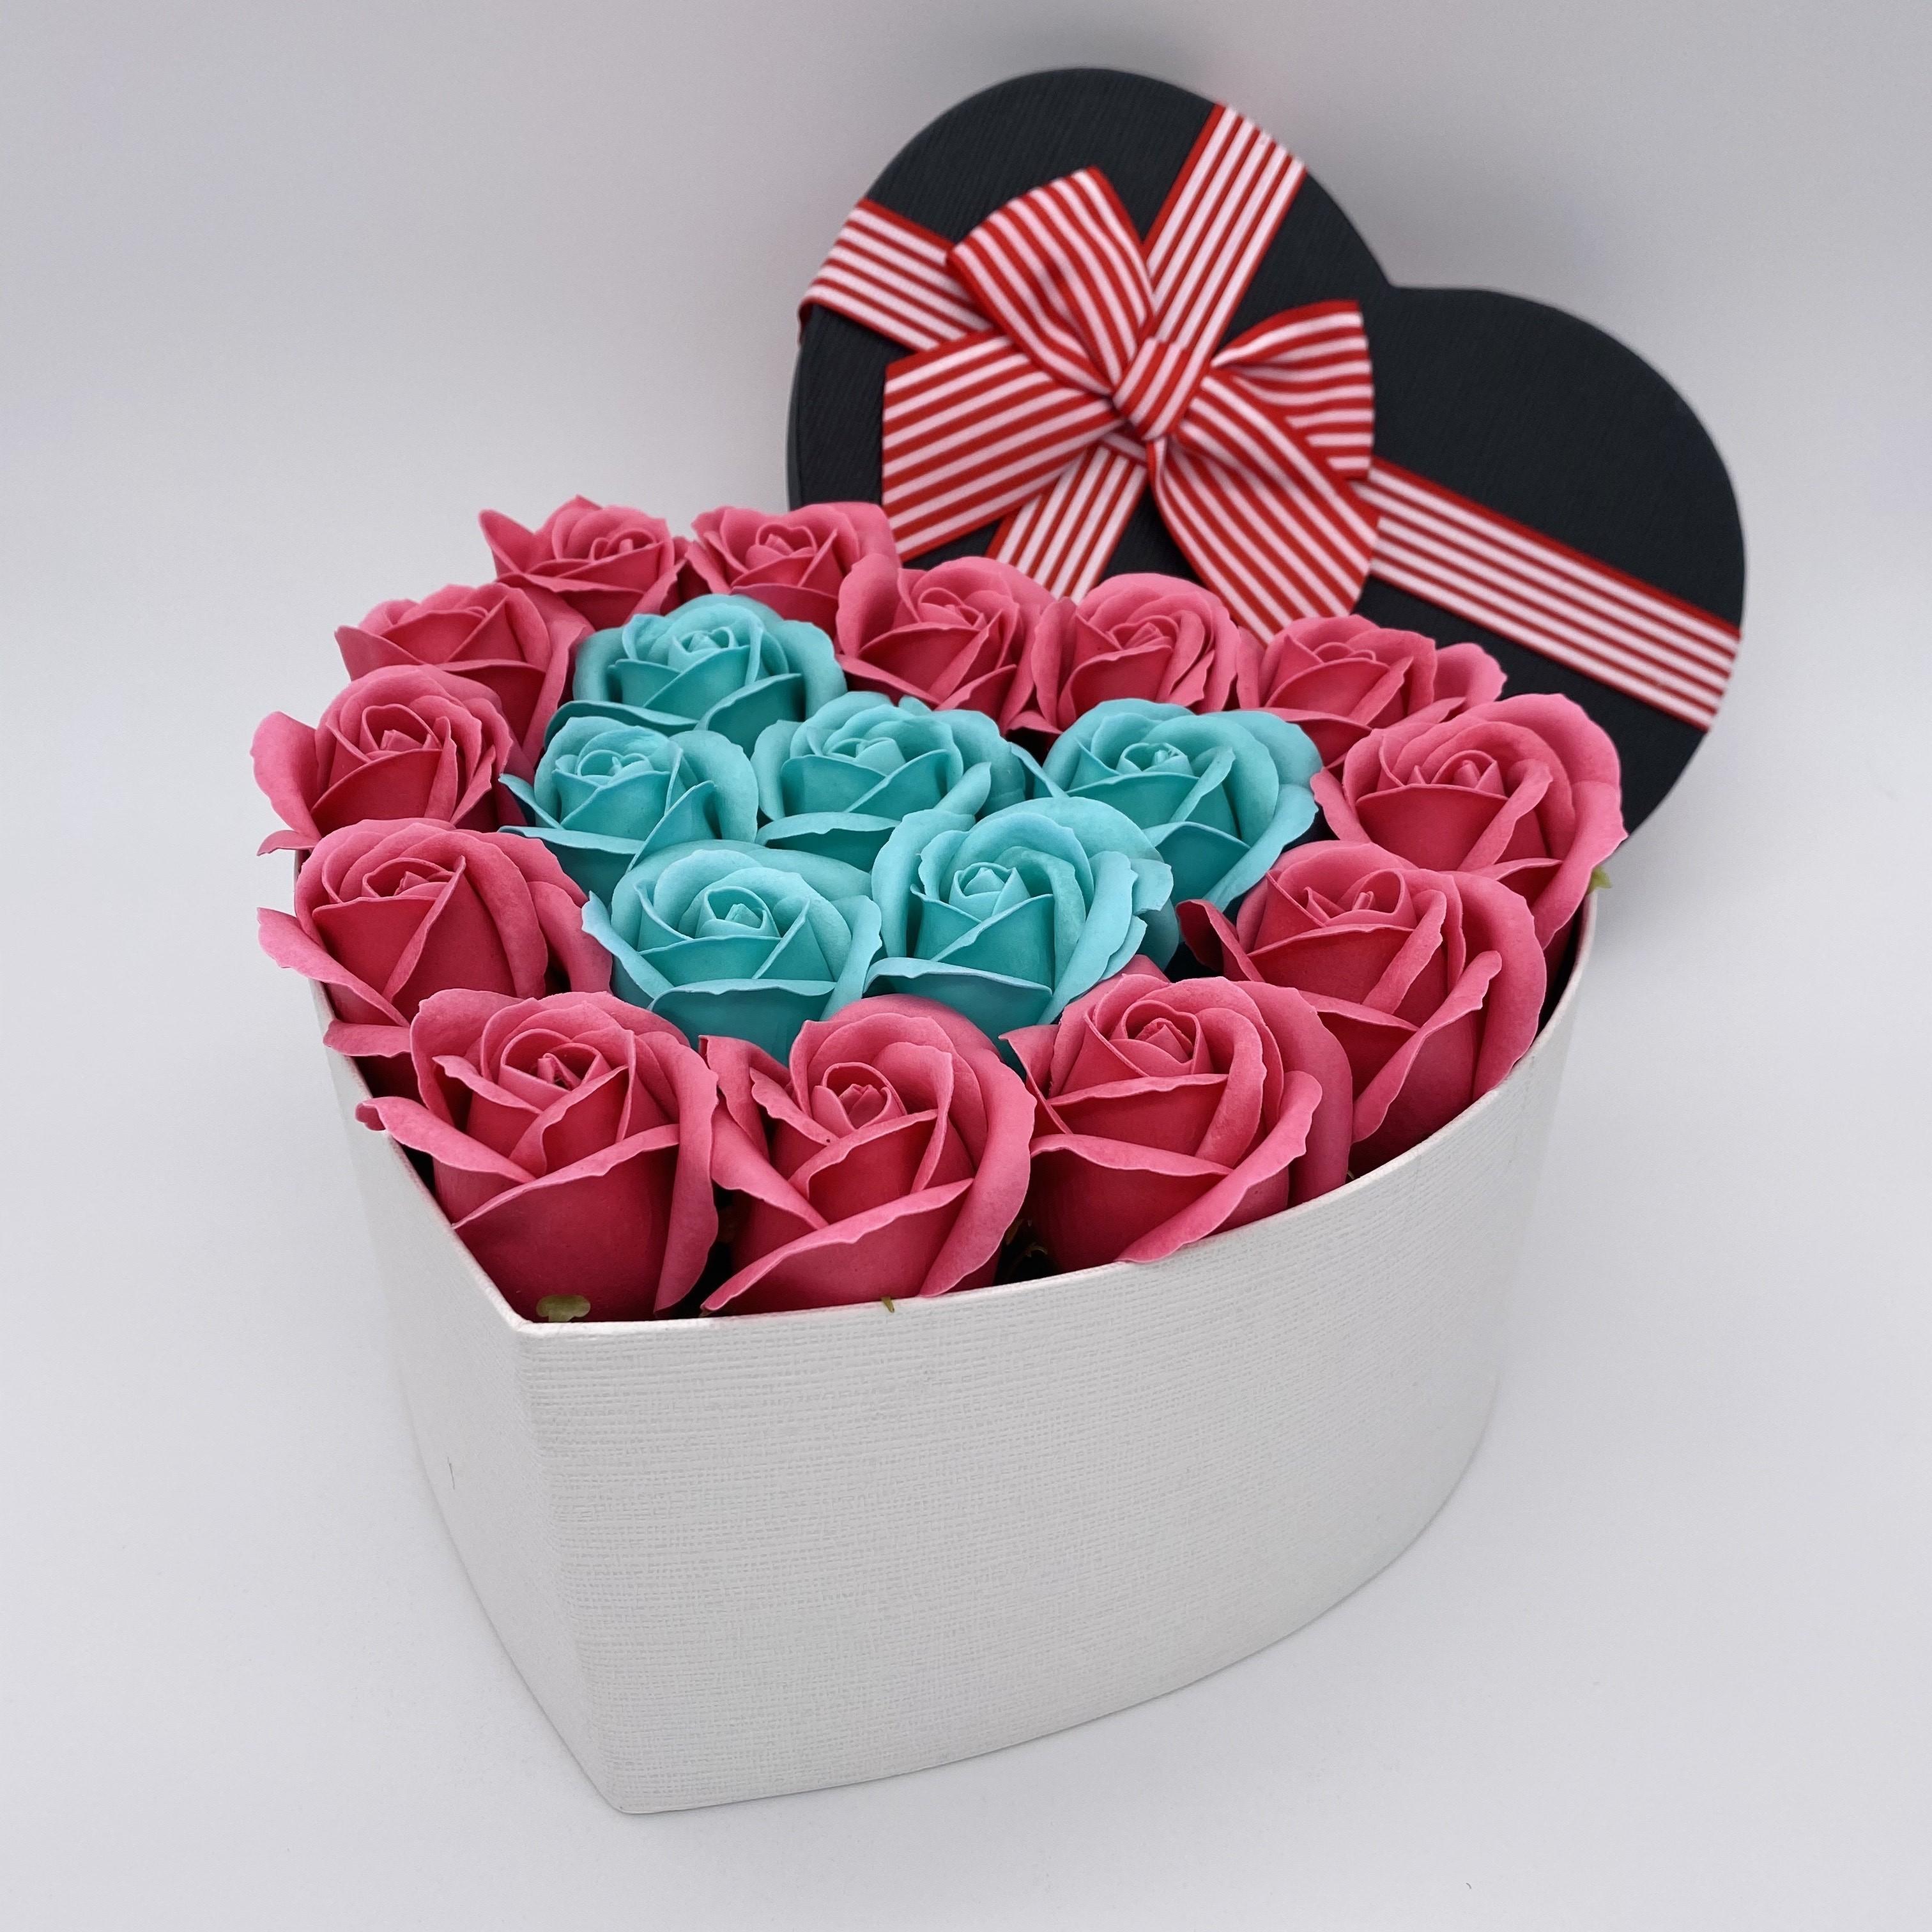 Aranjament Floral in forma de Inima, 25 Trandafiri Turcoaz/Roz, Cutie cu Funda, Mediu imagine techstar.ro 2021